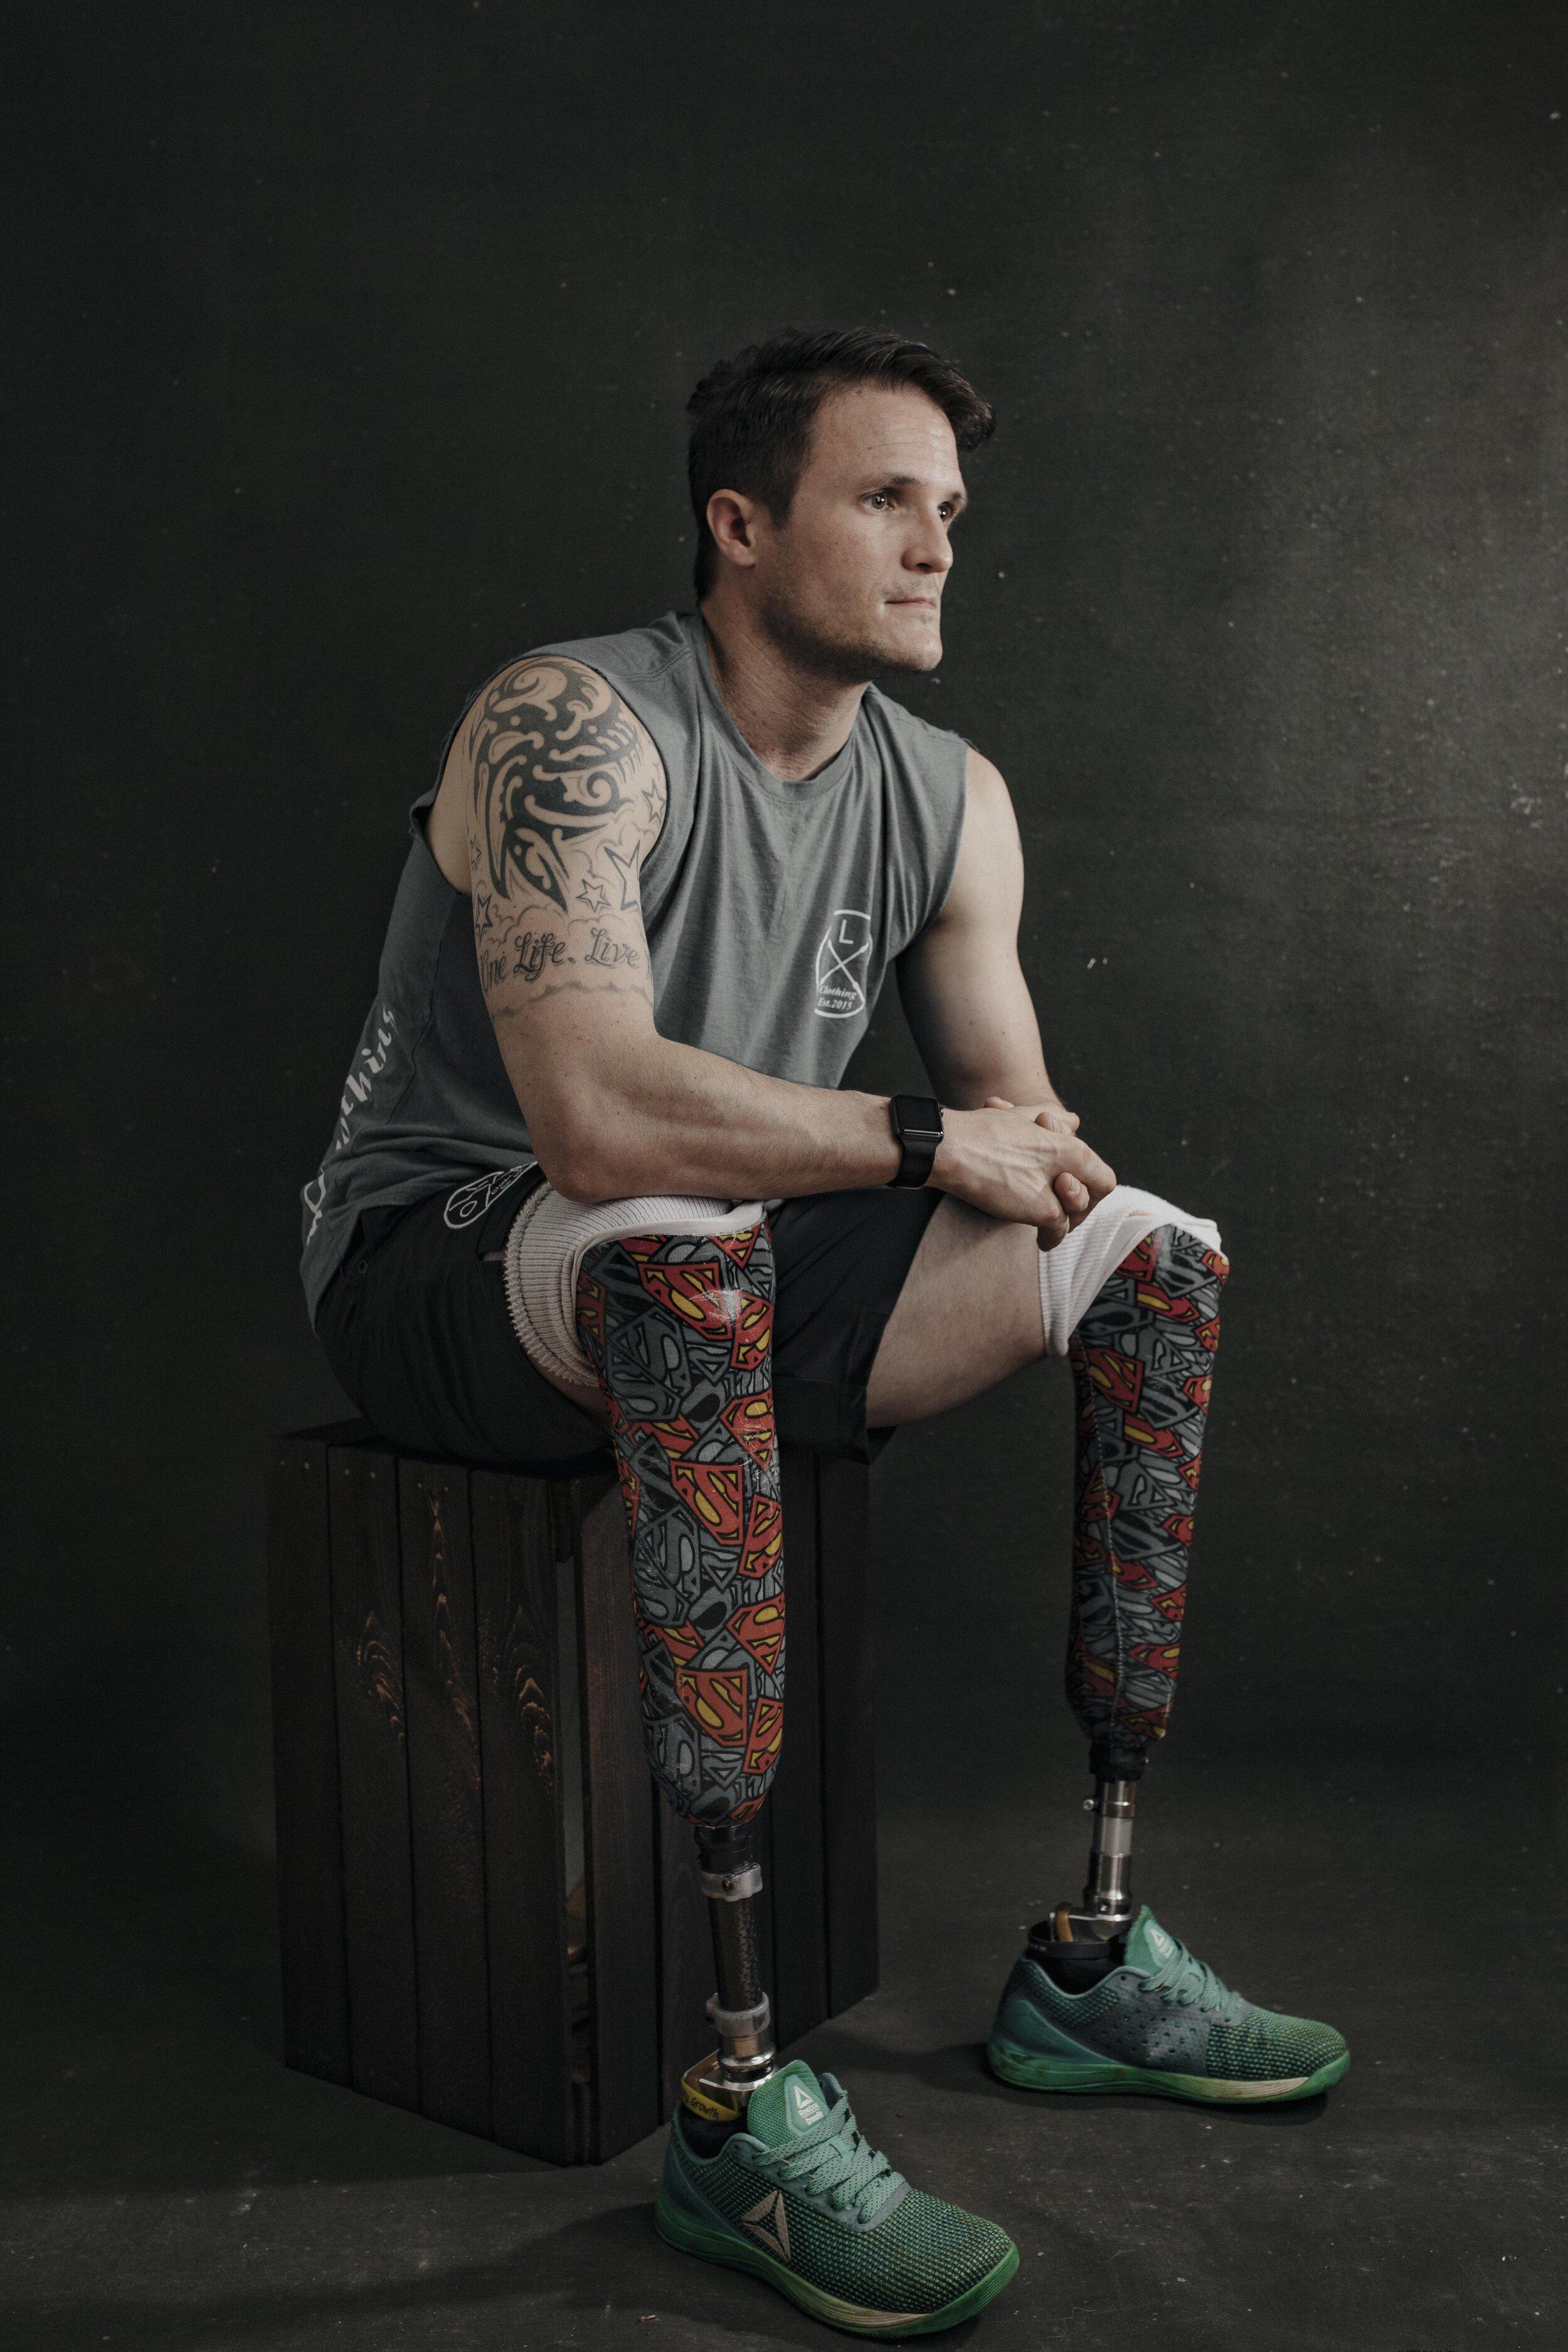 Stuart_mack_athlete_adaptive_2.jpg